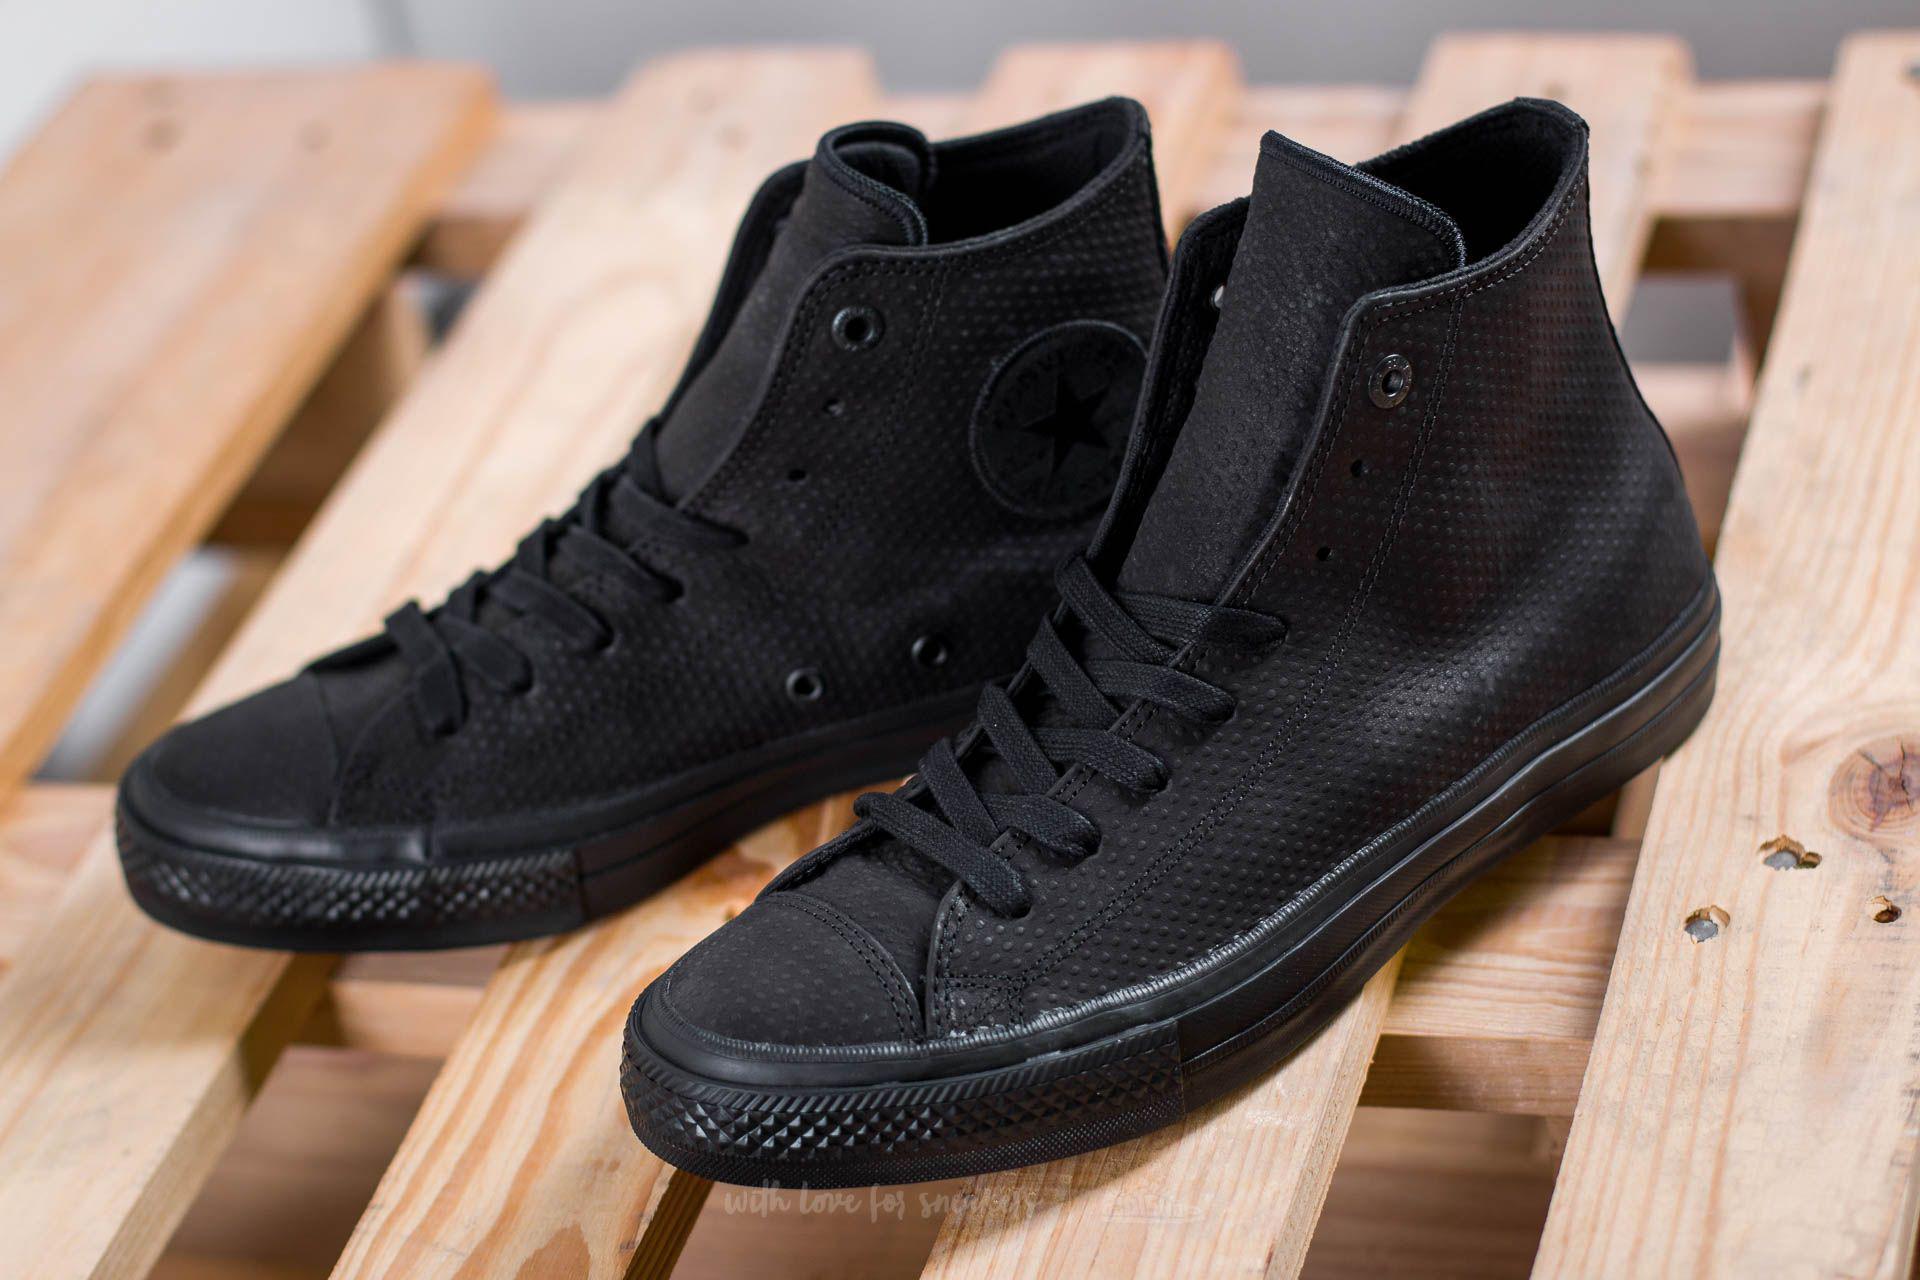 eea572b94ddd Lyst - Converse Chuck Taylor All Star Ii Hi Black  Black  Gum in ...